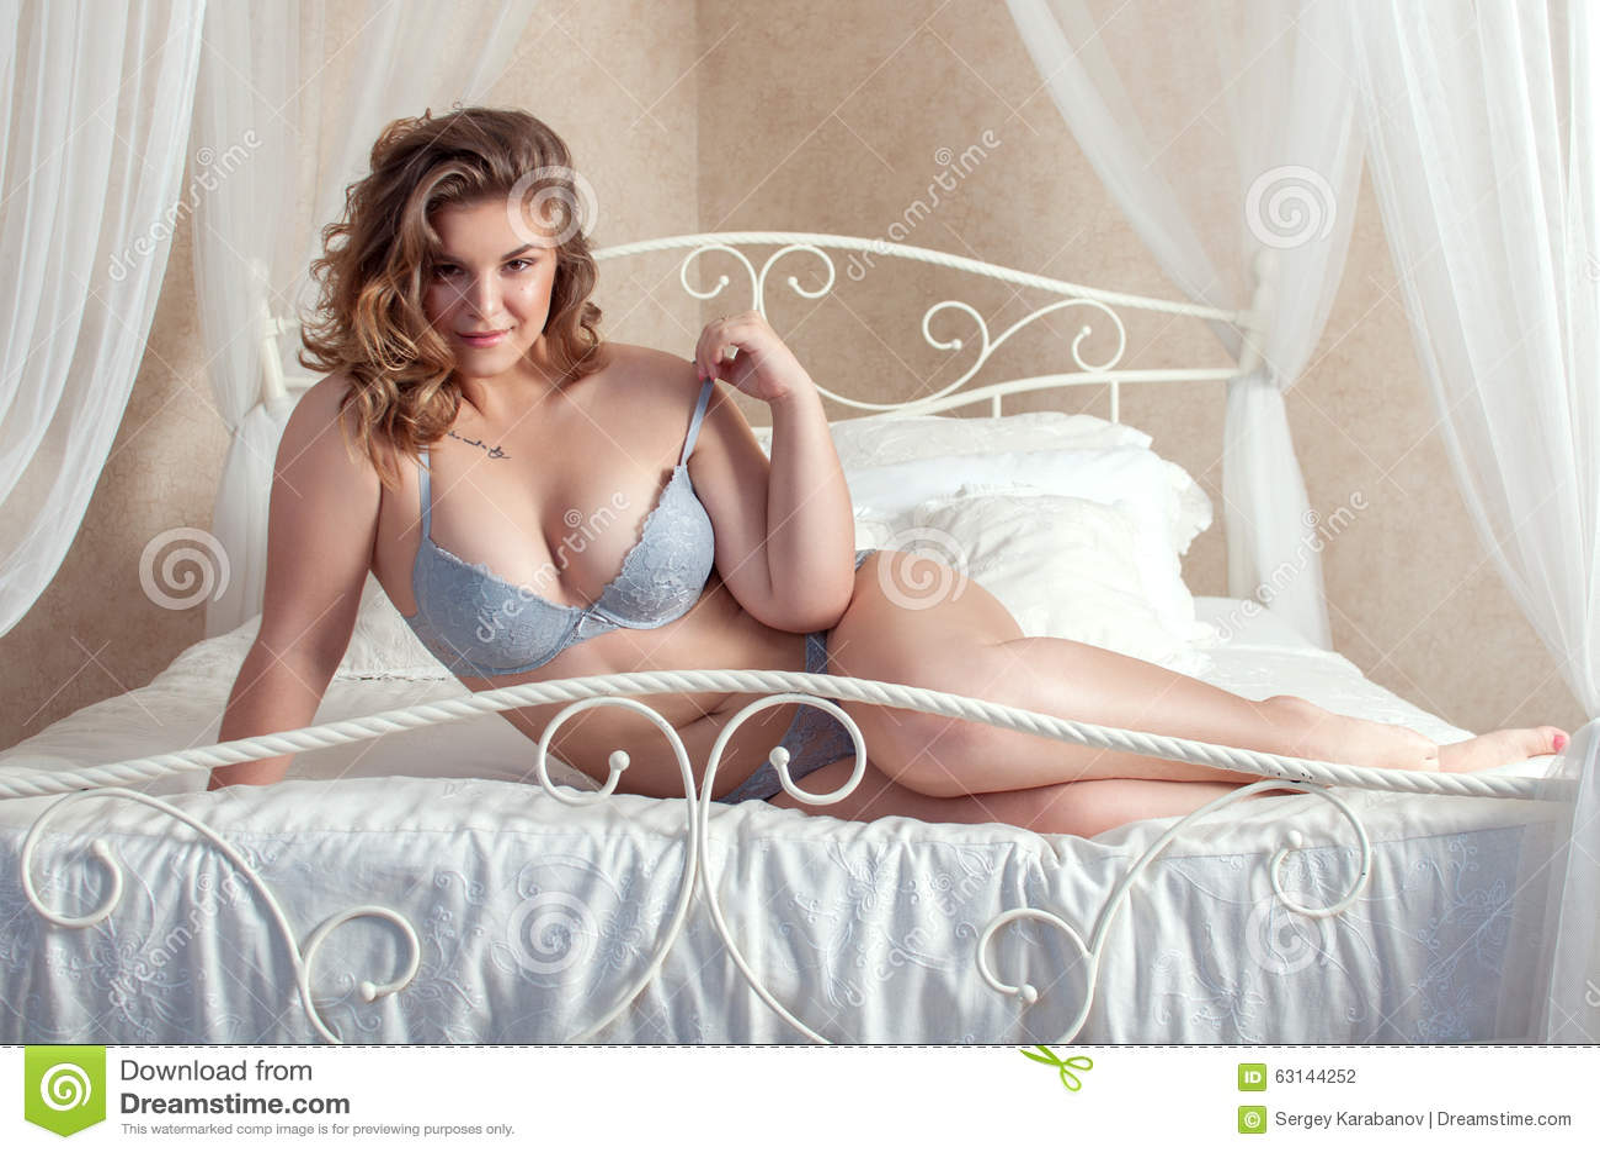 fille espi gle de taille plus se situant dans le lit photo stock image du positif fille 63144252. Black Bedroom Furniture Sets. Home Design Ideas